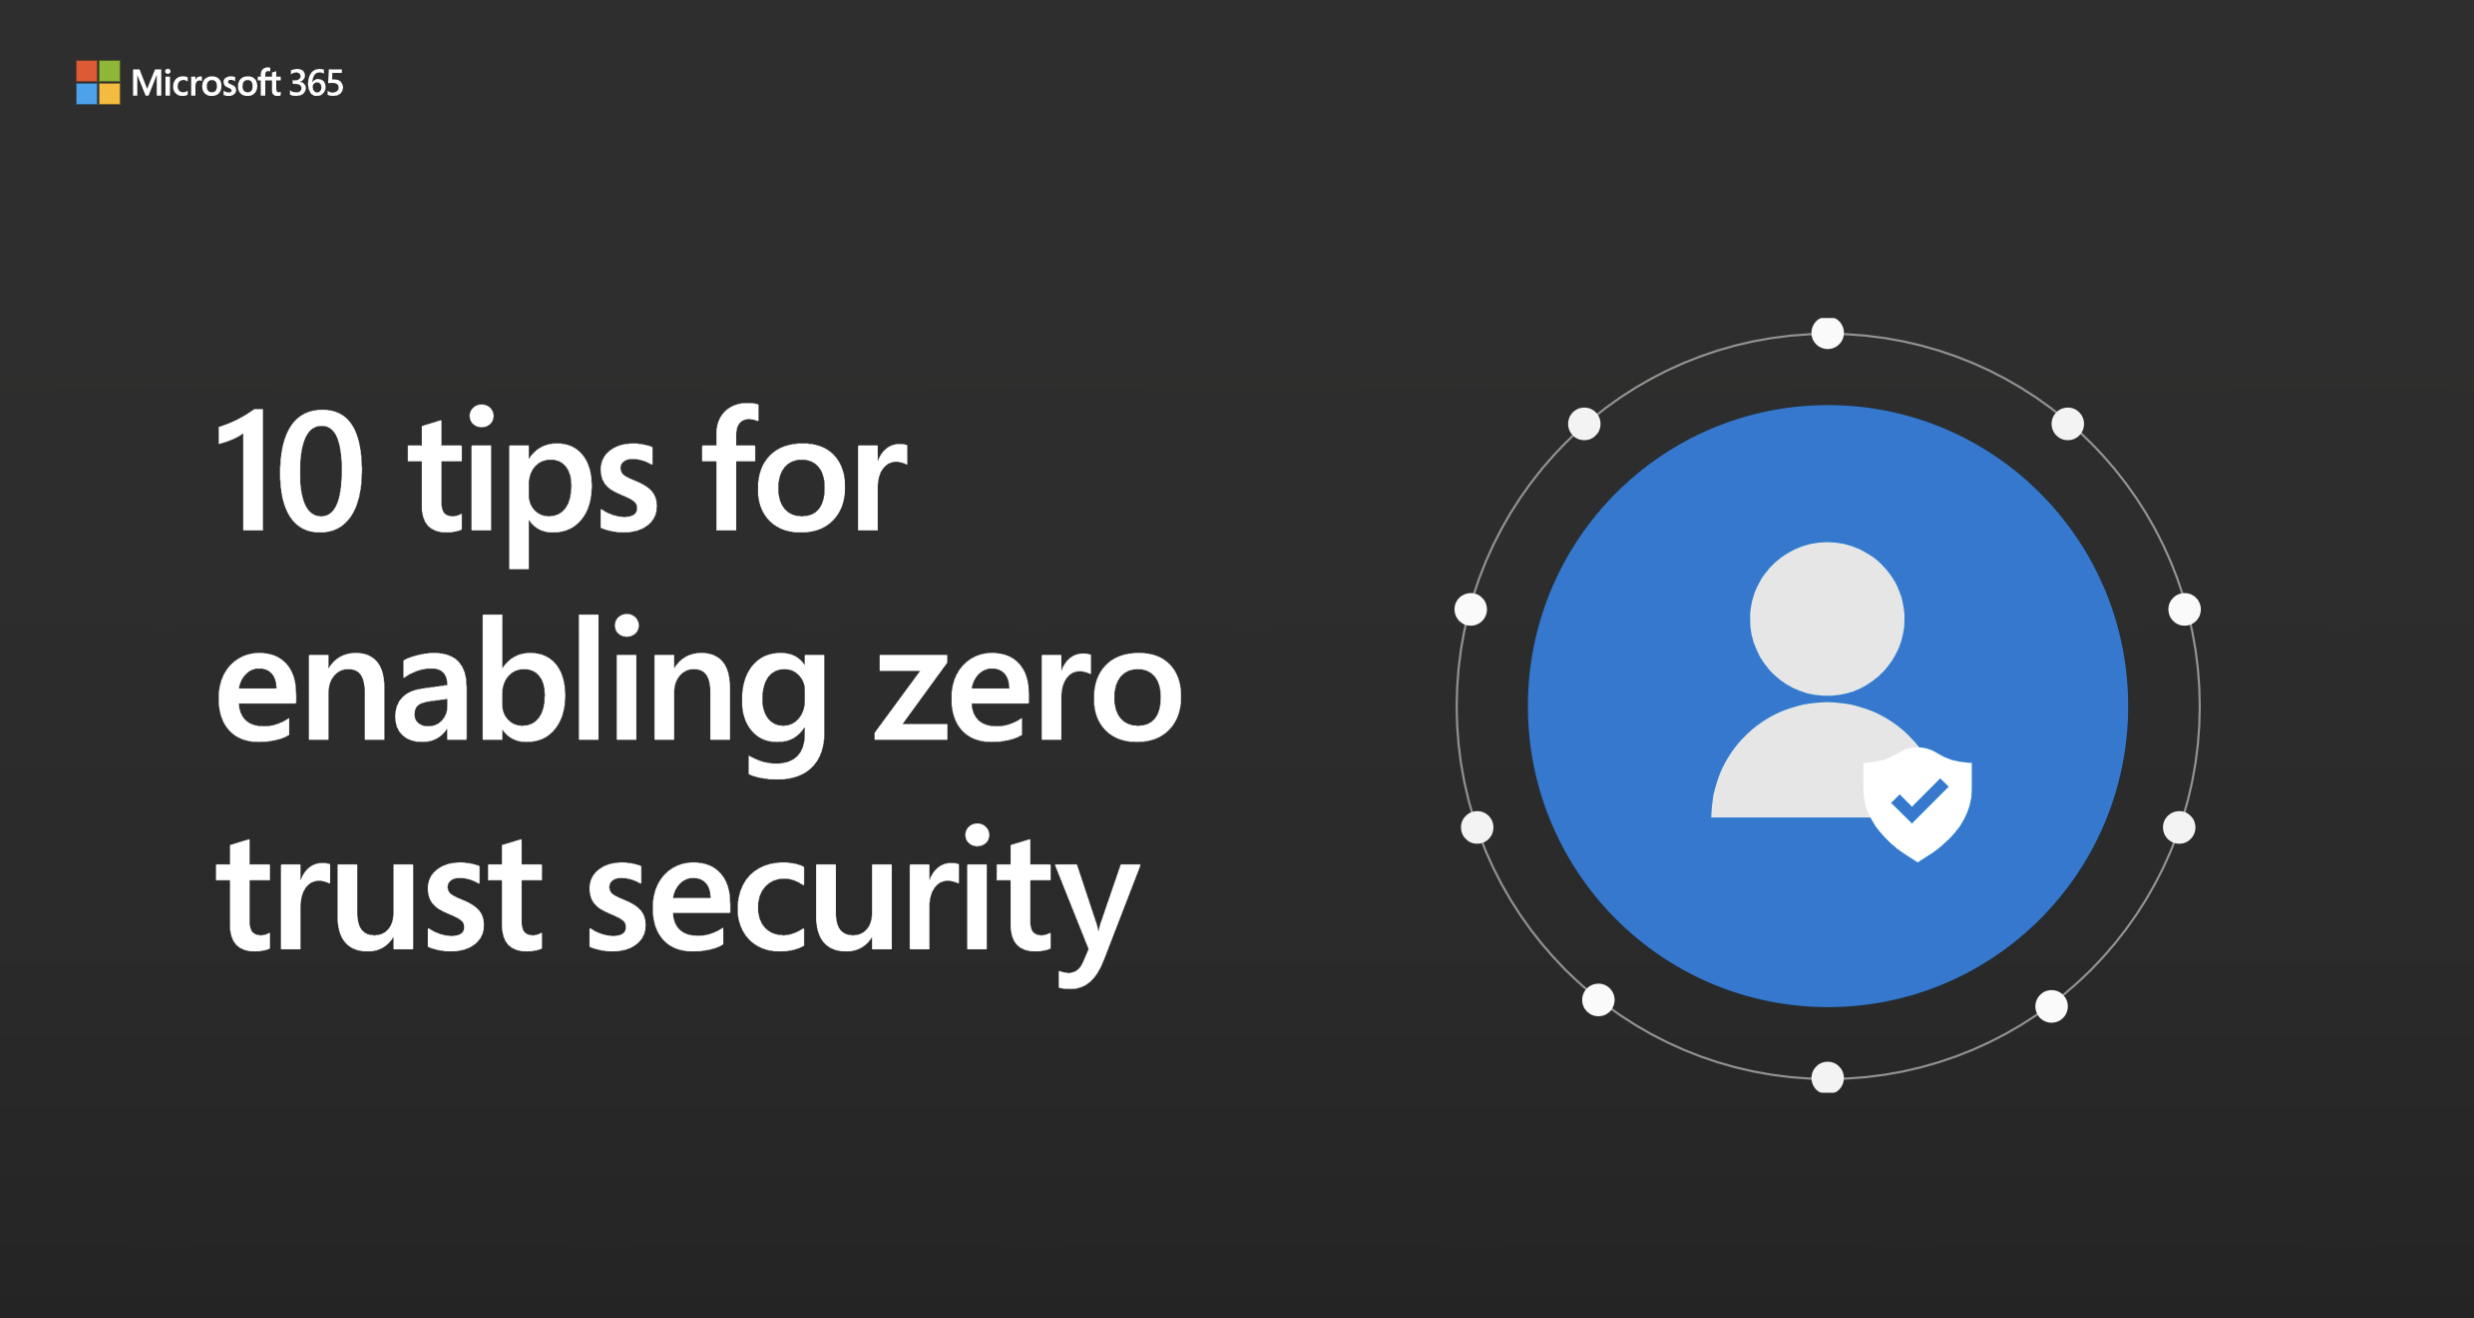 10 tips for enabling Zero Trust security